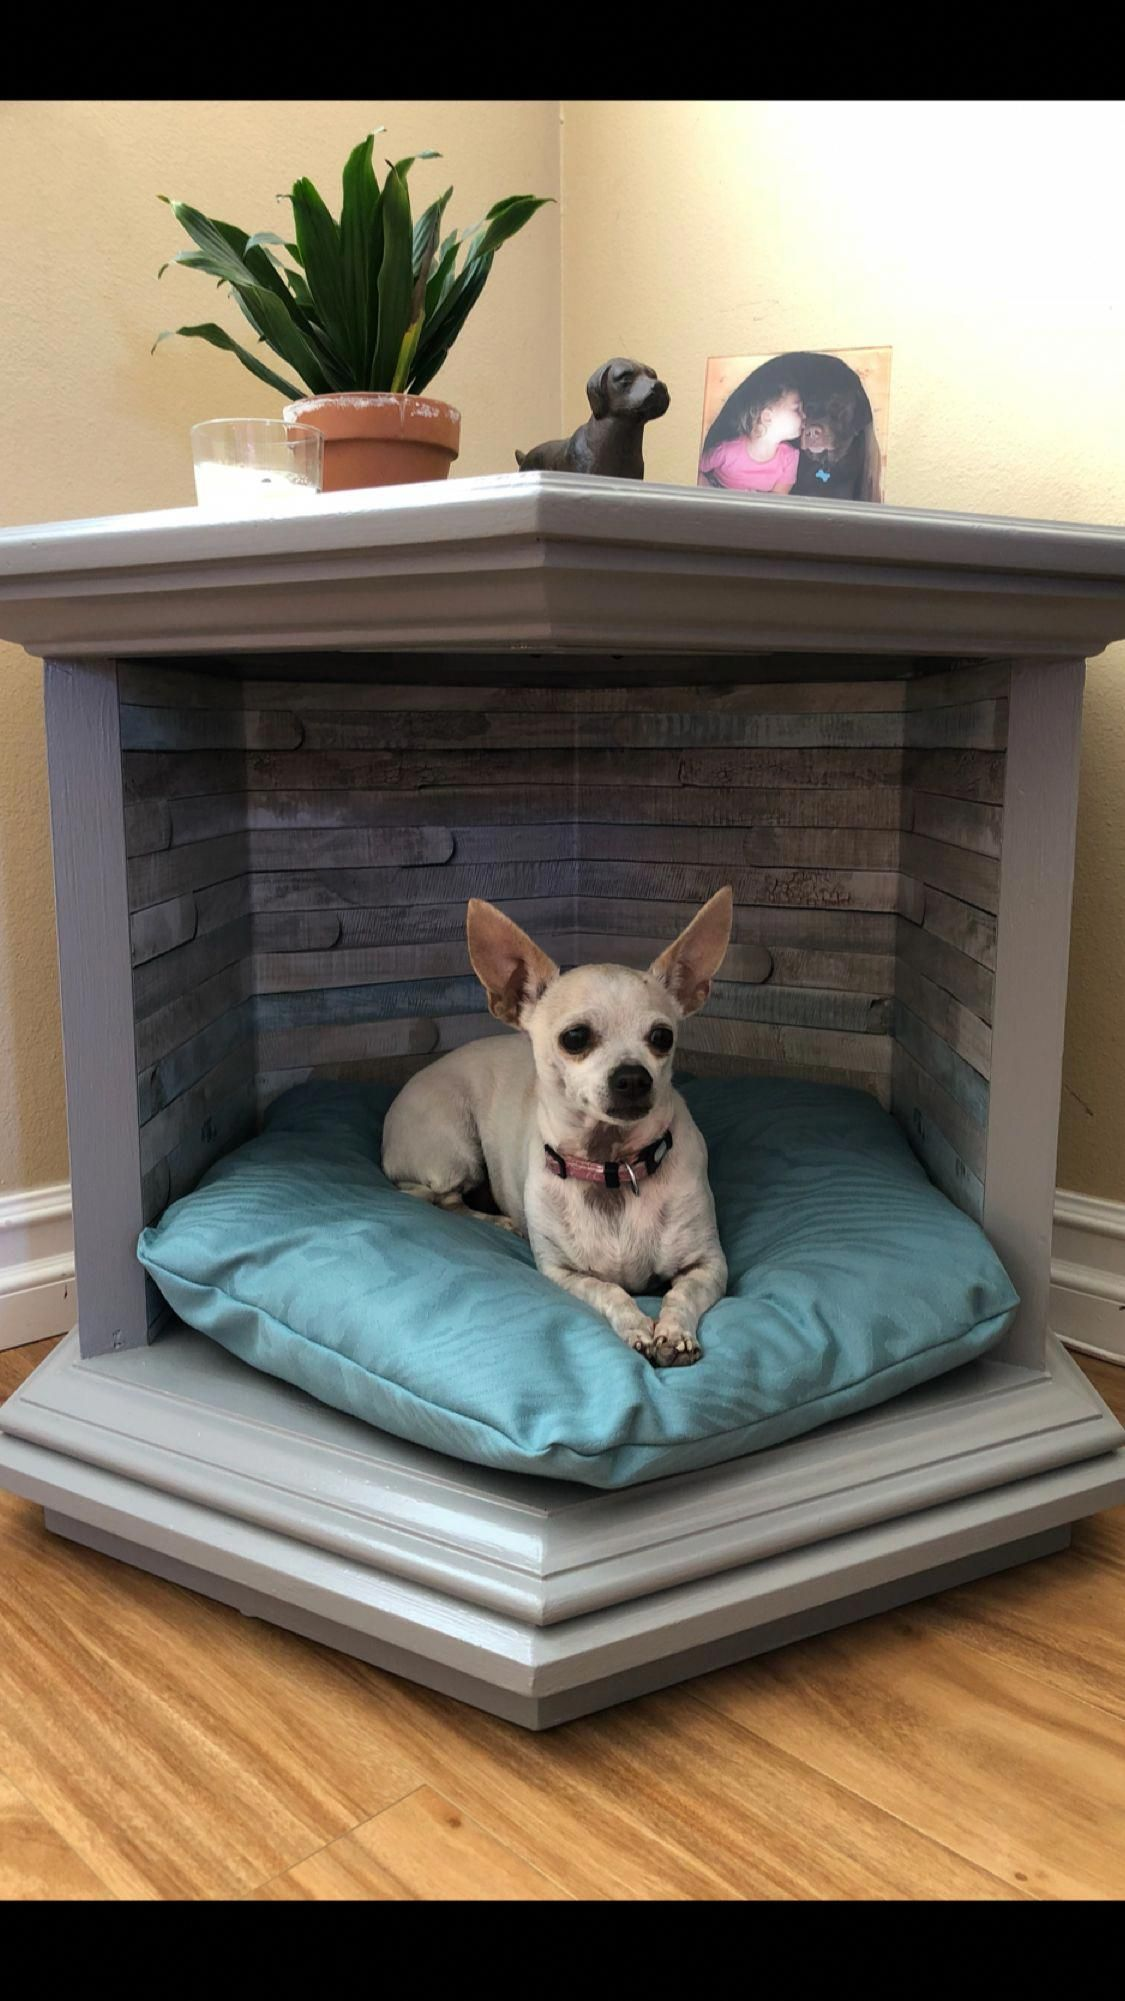 Dog Beds Off The Floor Dog Beds For Medium Dogs Clearance Doggo Dog Dogbed Diy Pet Bed Diy Dog Bed Custom Pet Bed